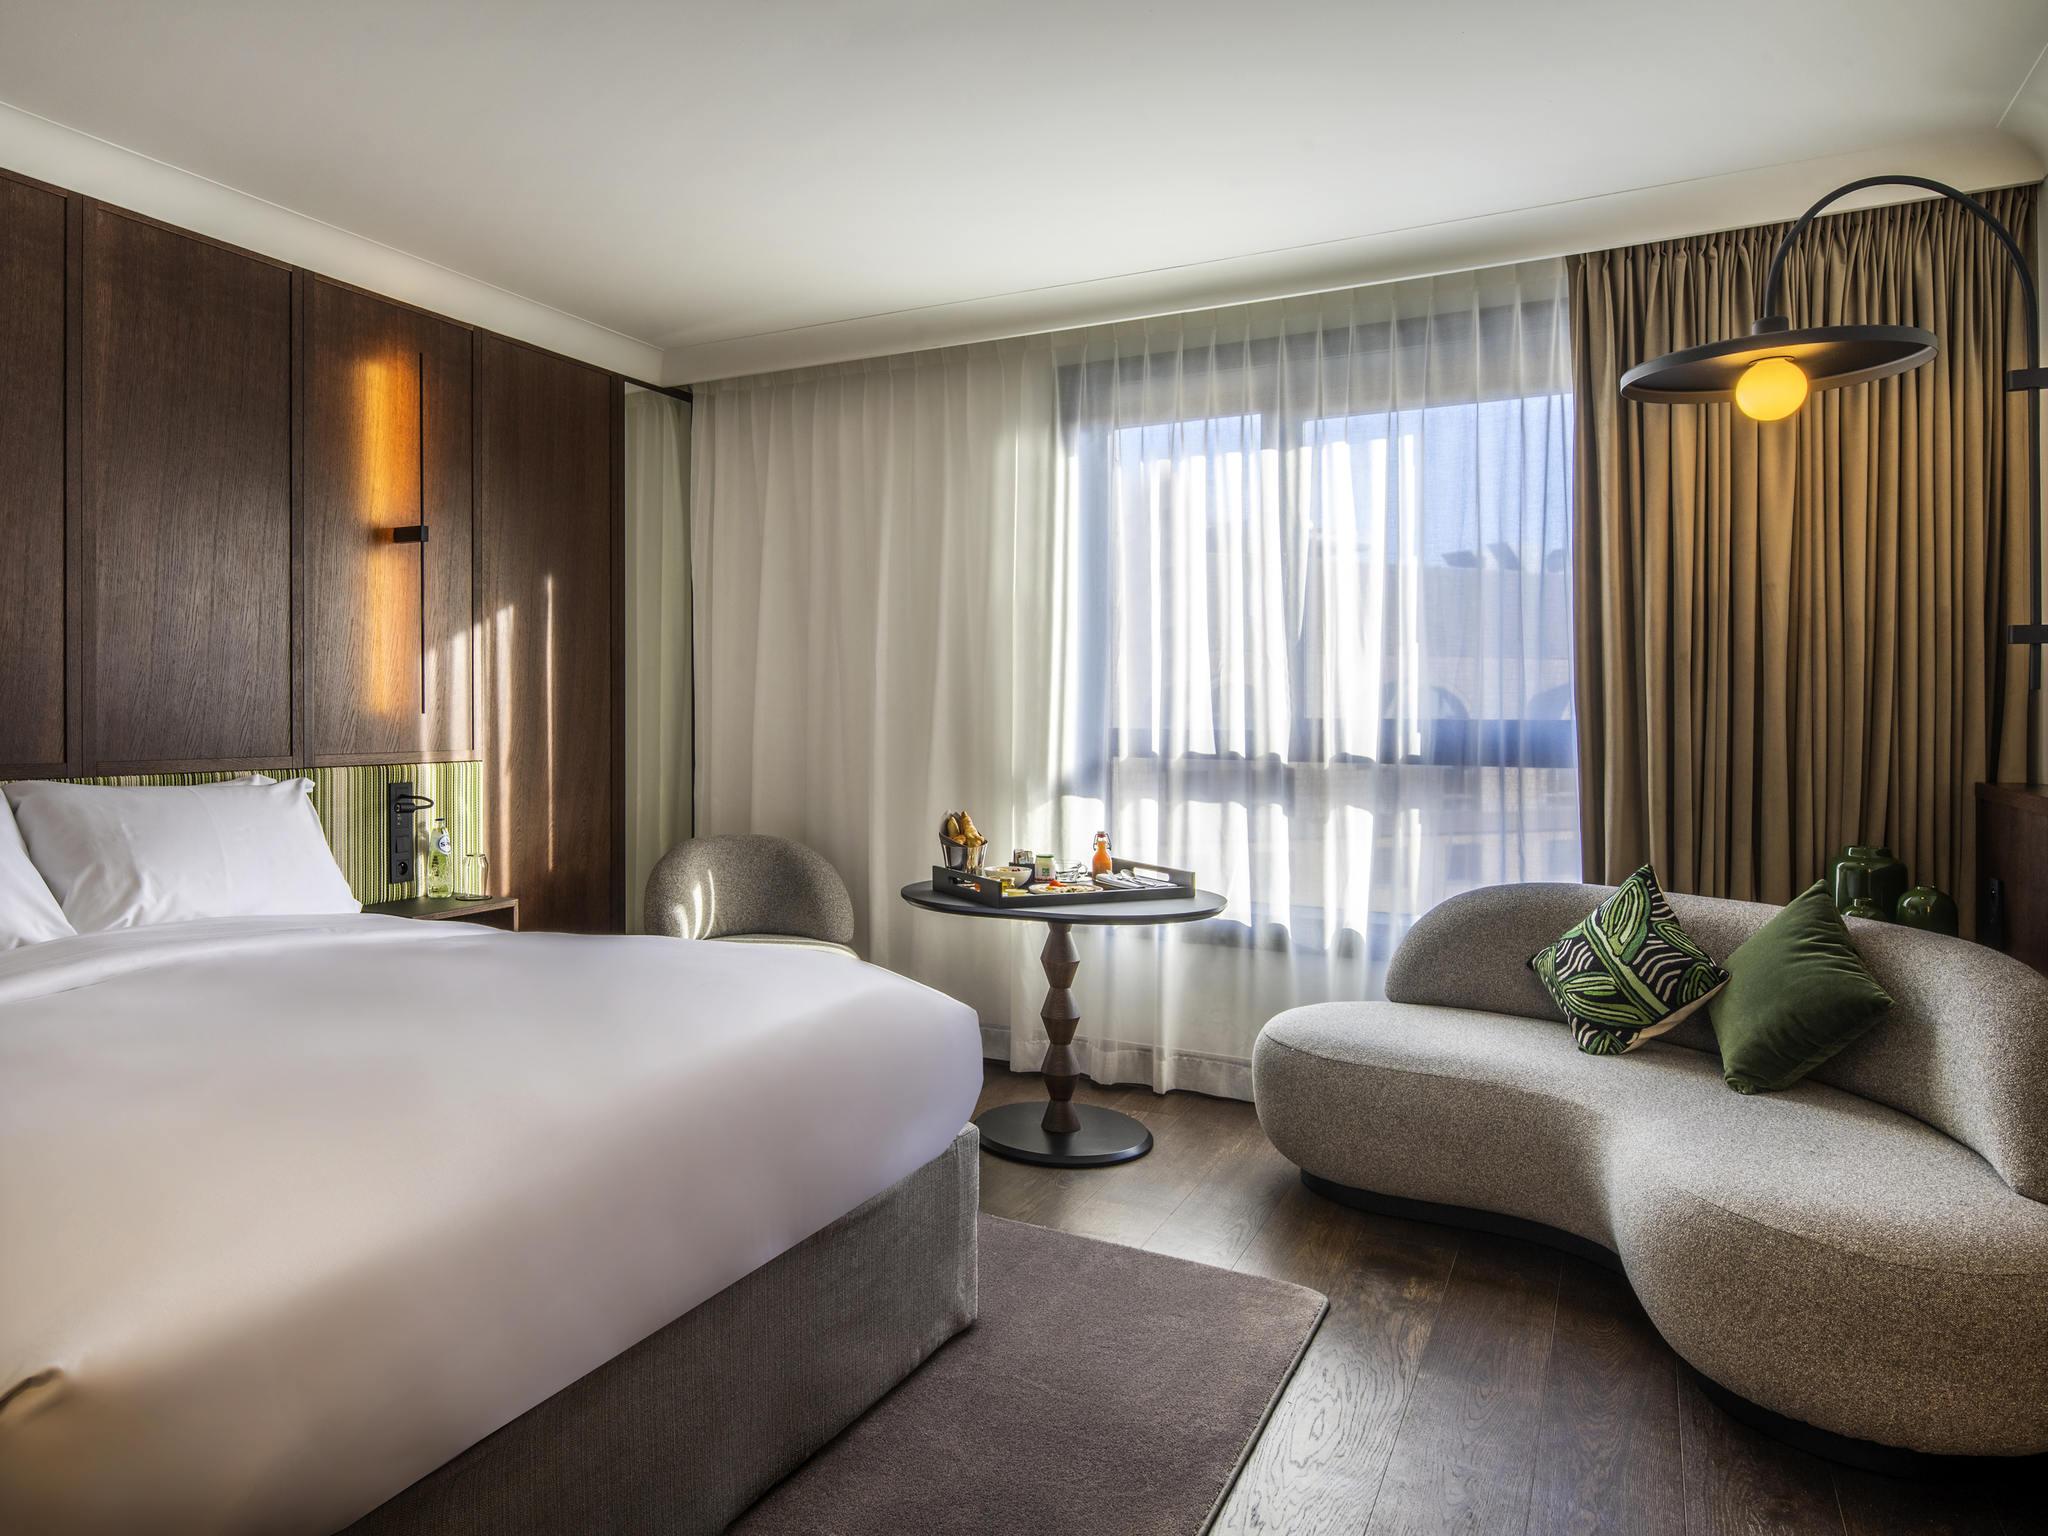 Hotel – Sofitel Brussels Le Louise